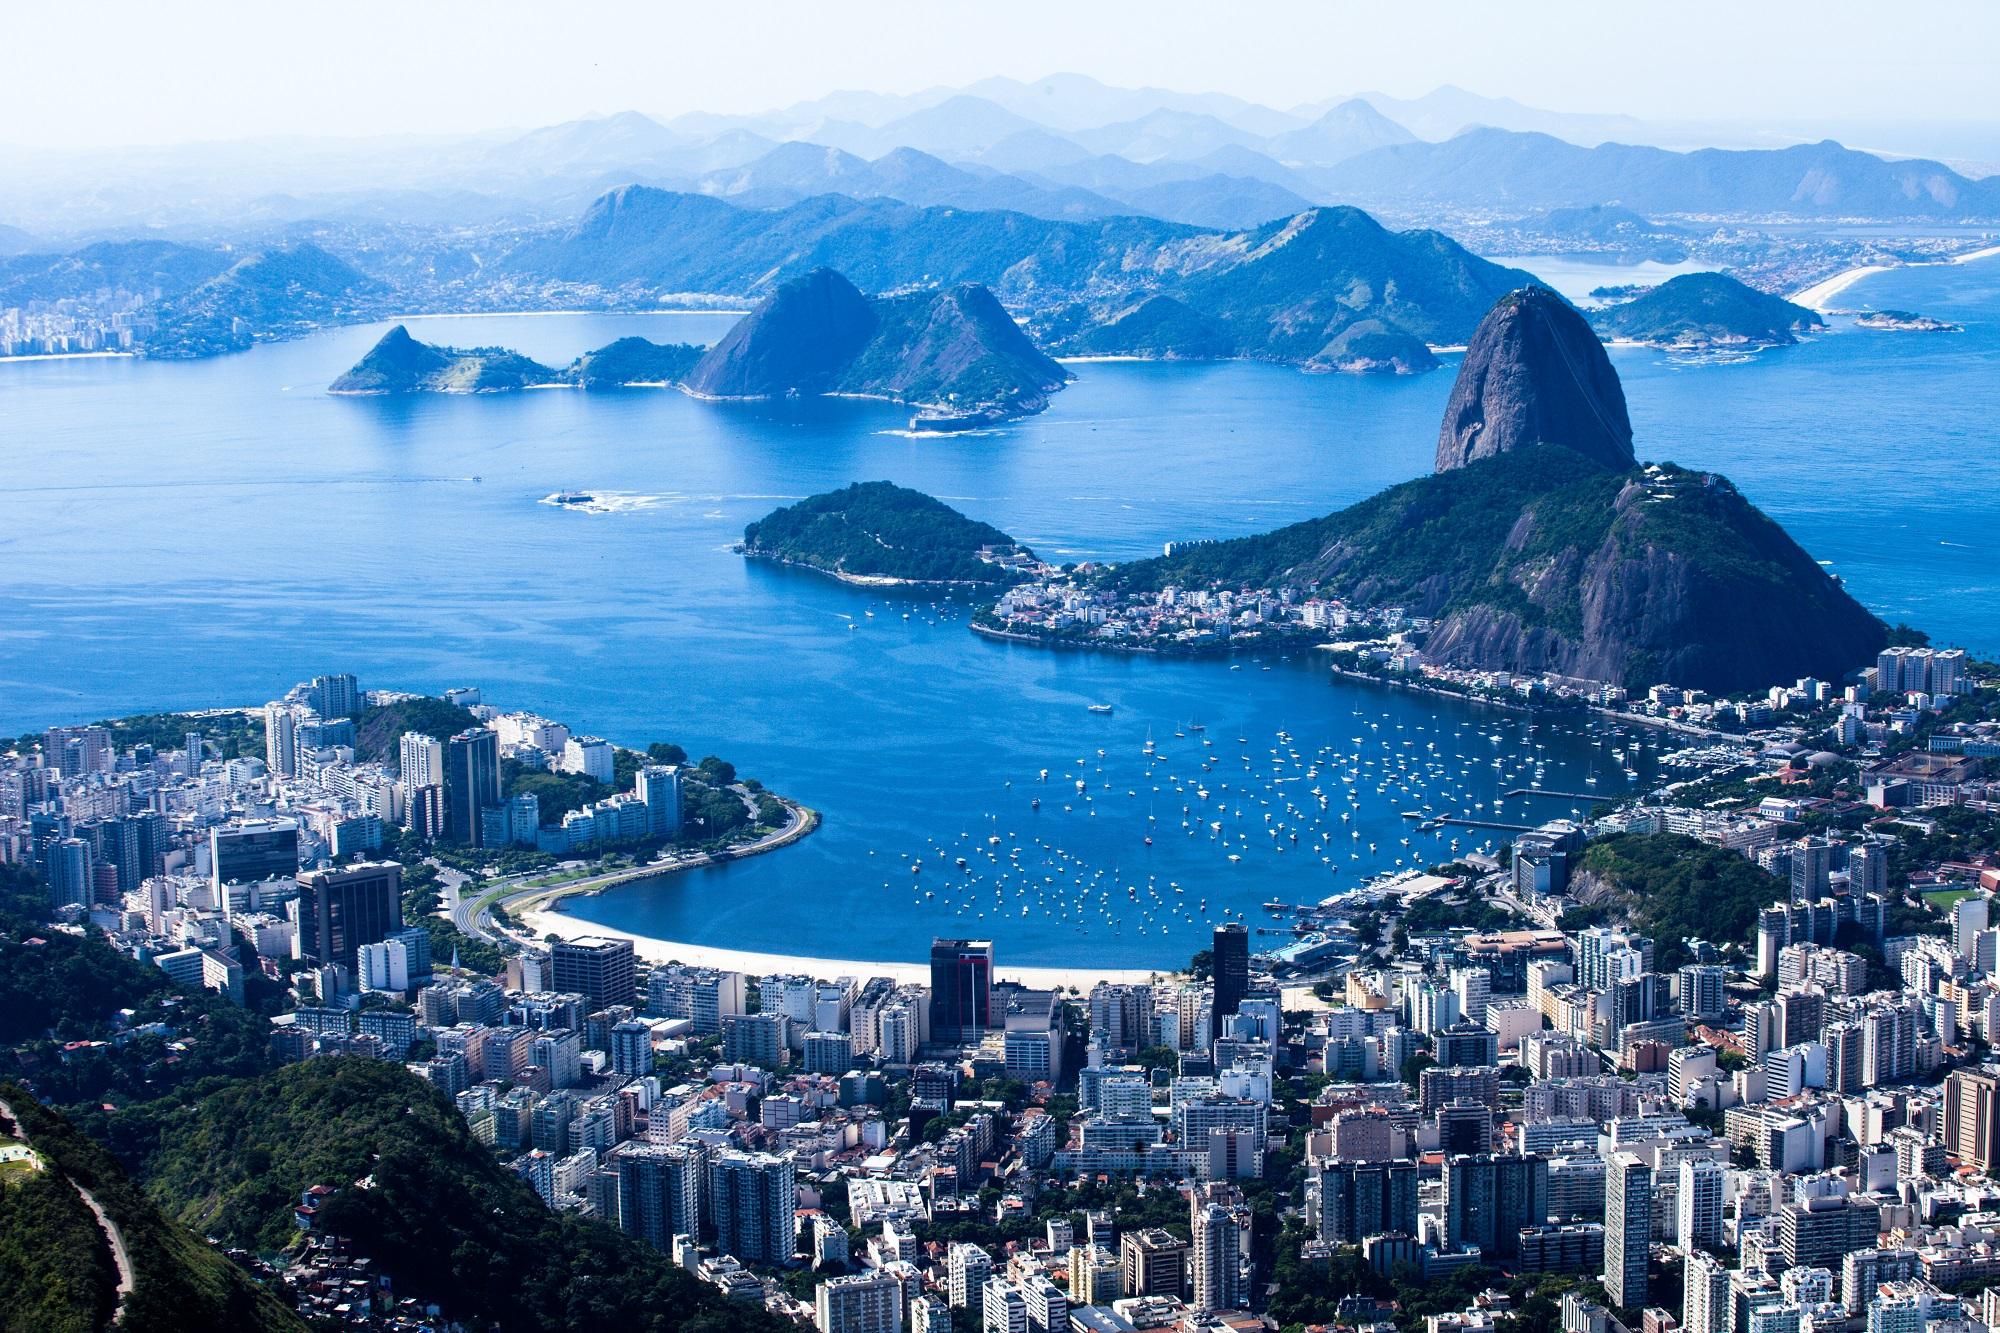 Suggar Loaf and Botafogo in Rio de Janeiro in Brazil.